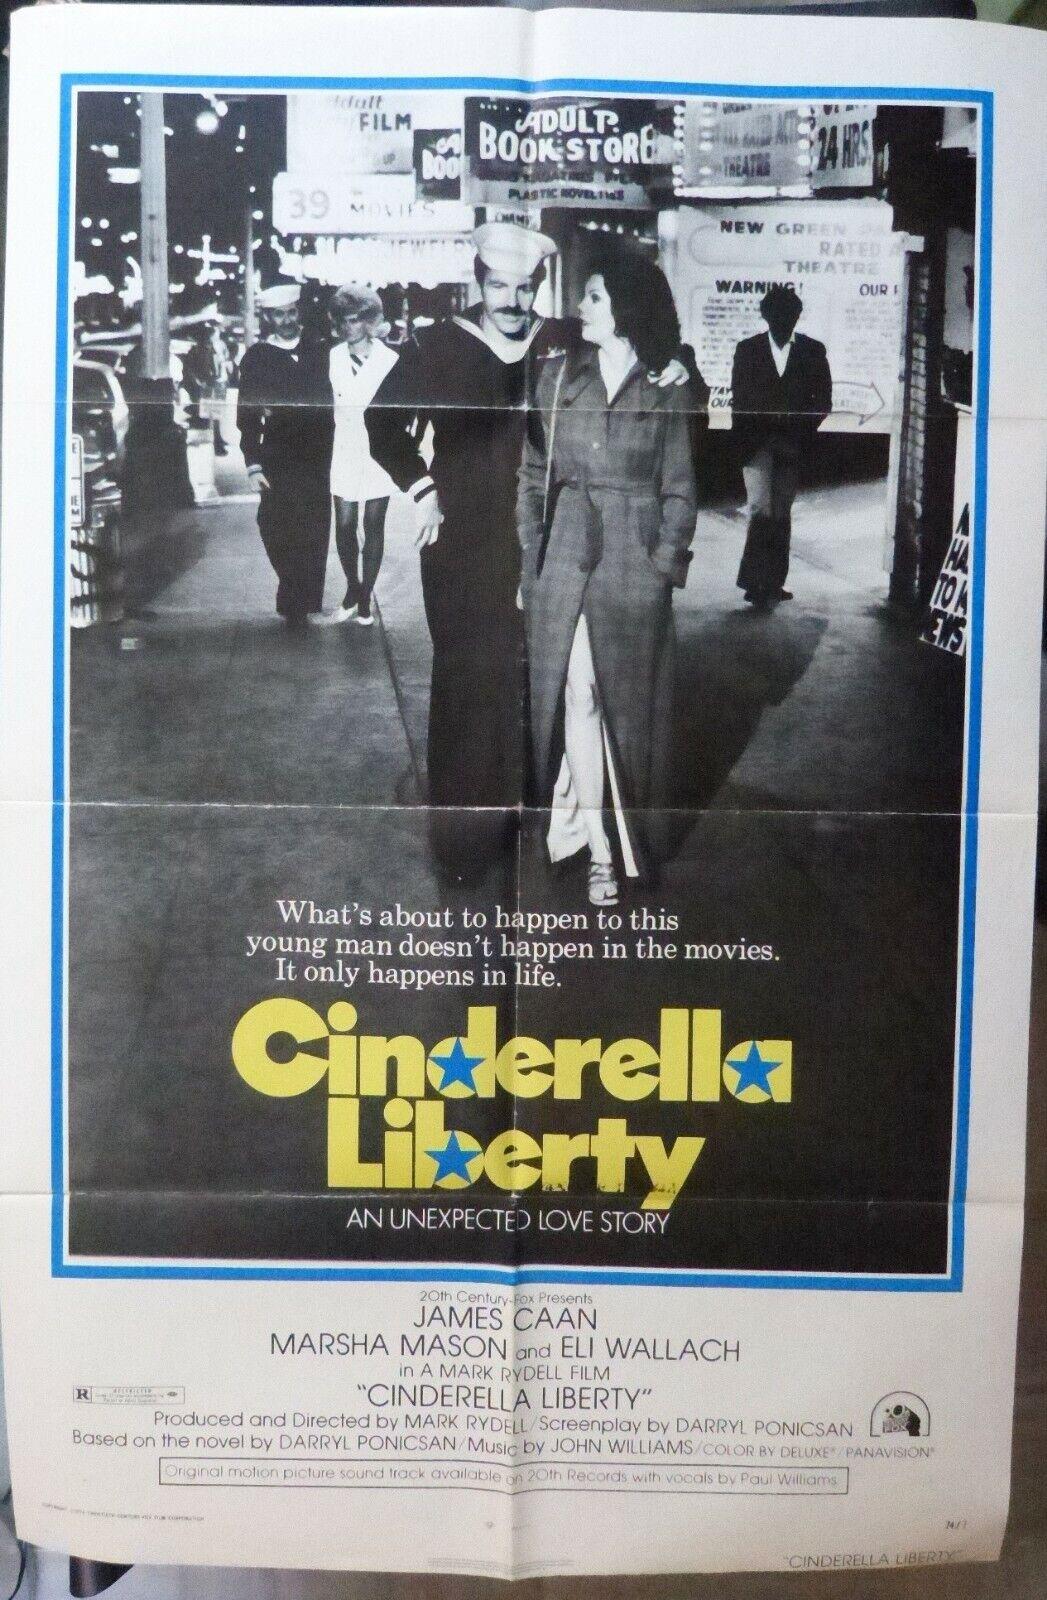 Cinderella Liberty Movie Poster,1 sheet,Original,1974,Folded,James Caan